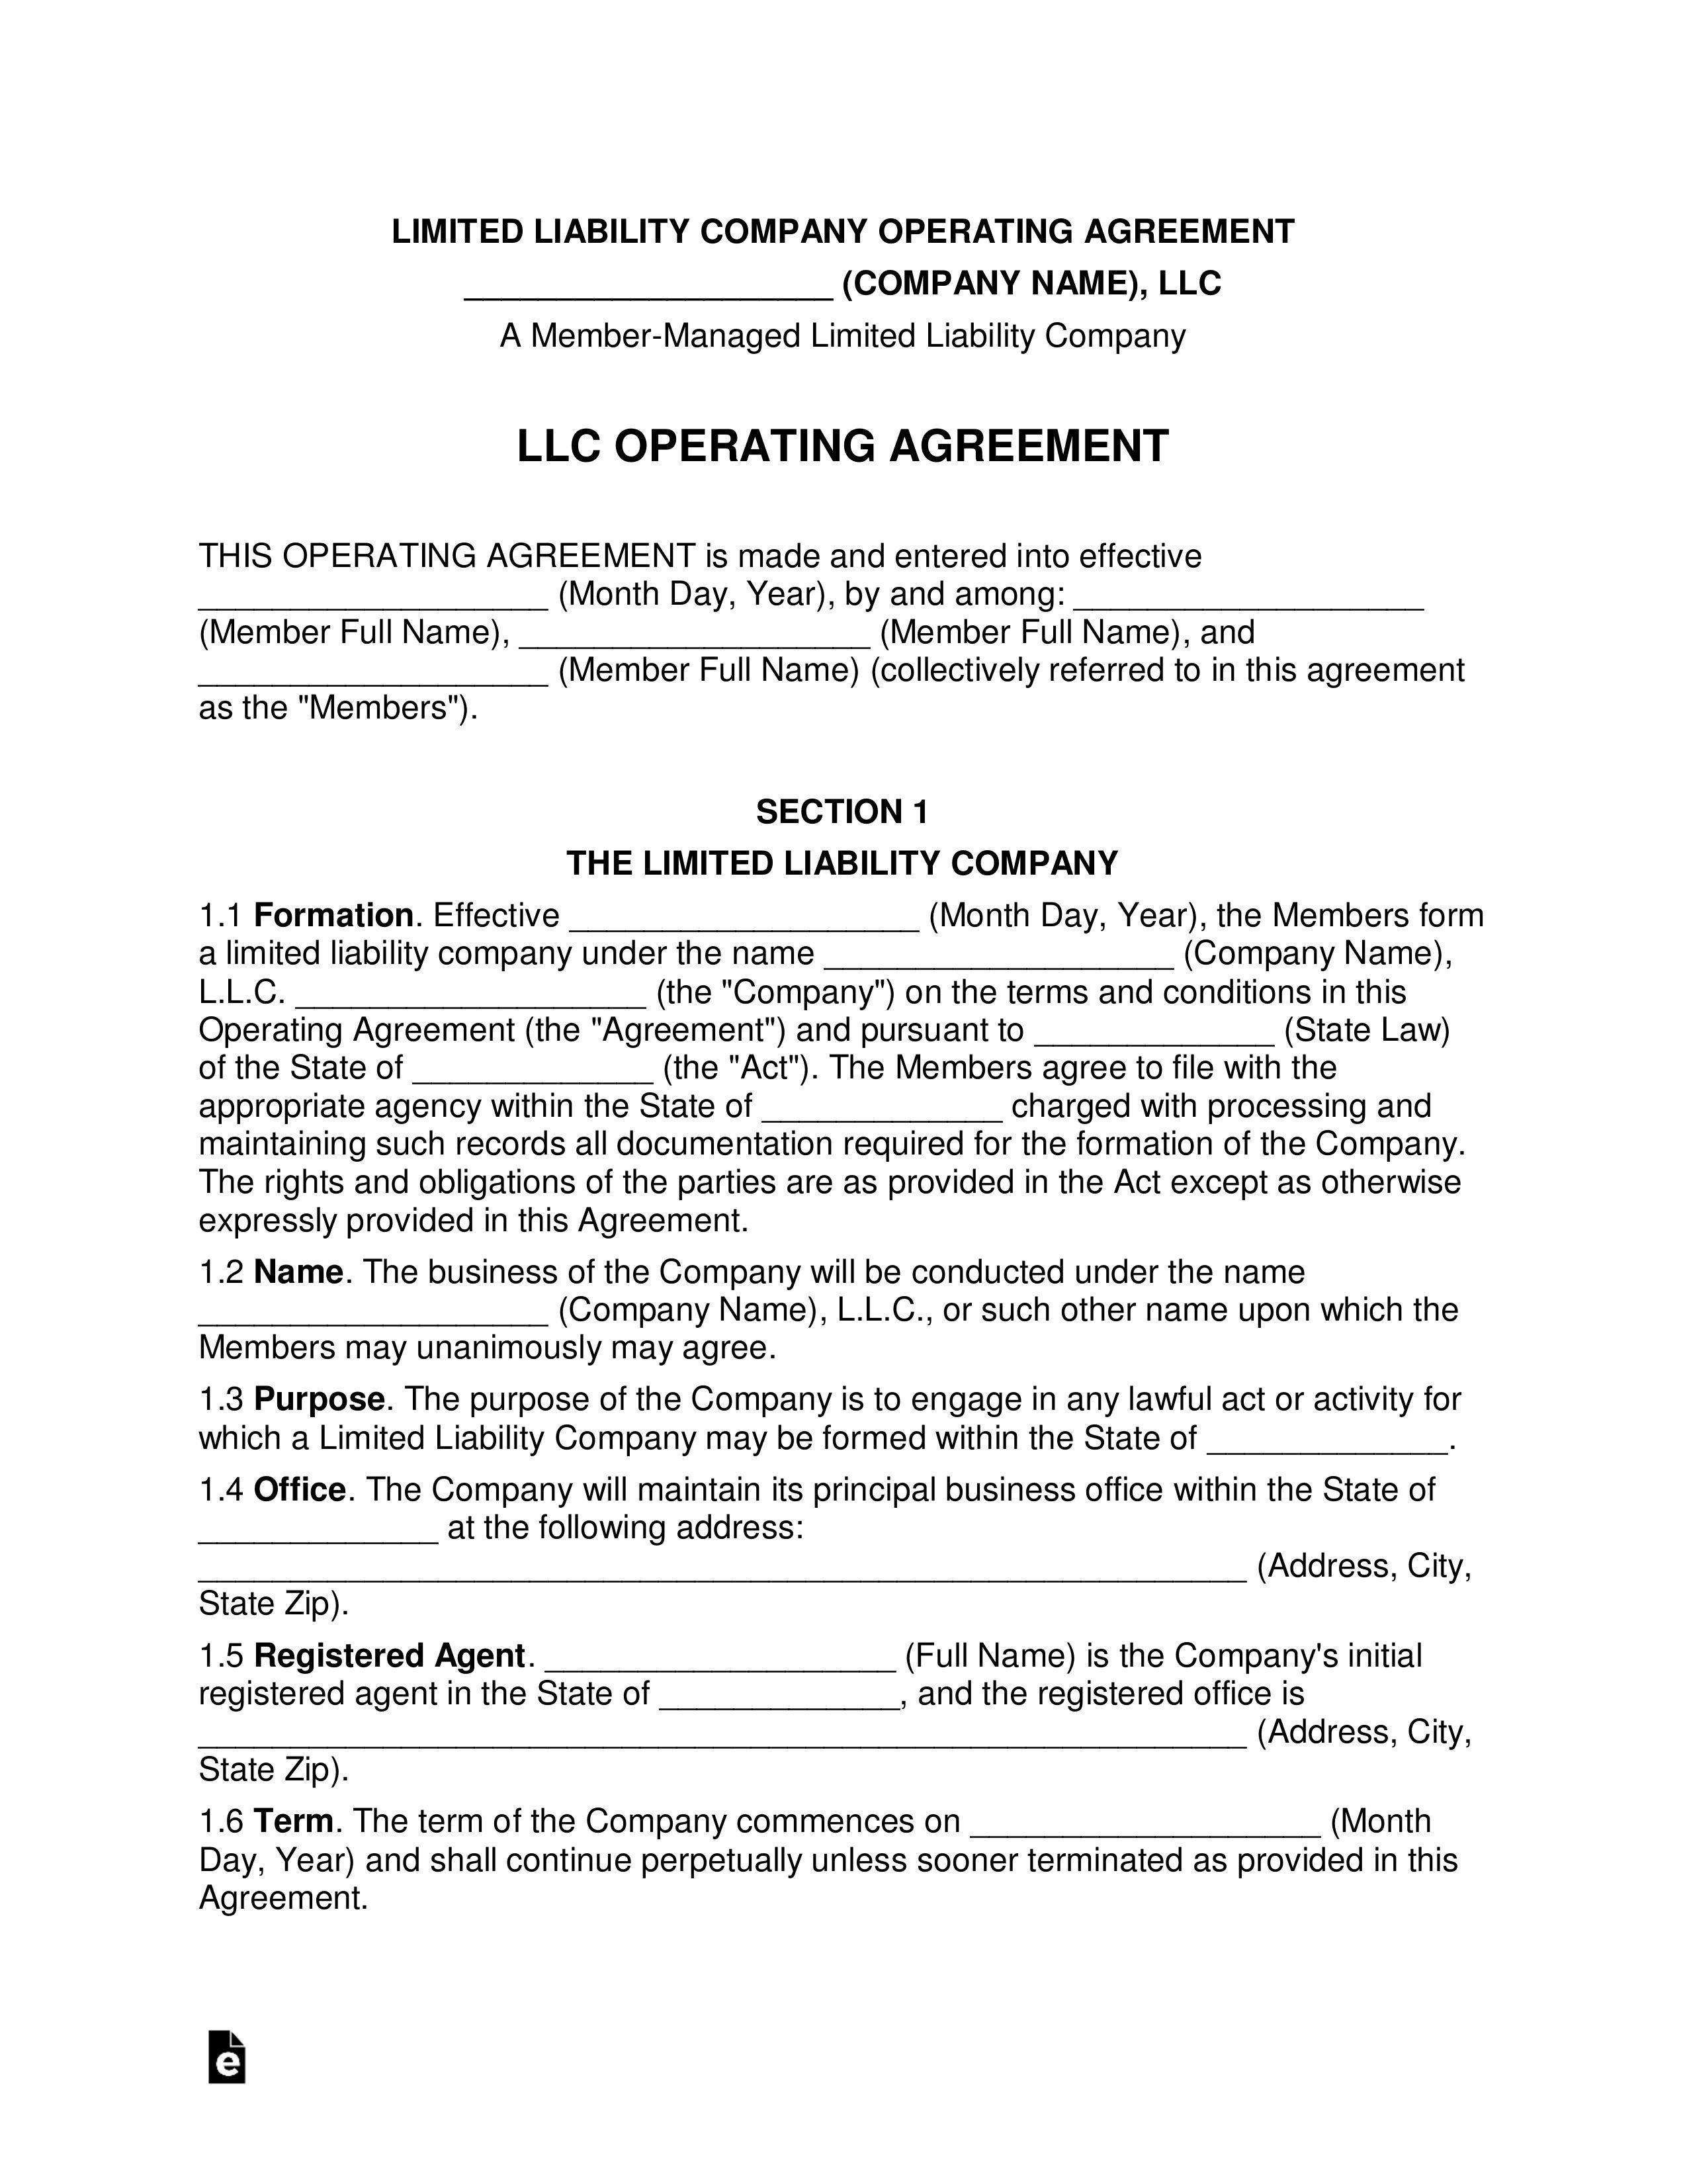 007 Awful Free Operating Agreement Template Highest Quality  Pdf Missouri LlcFull